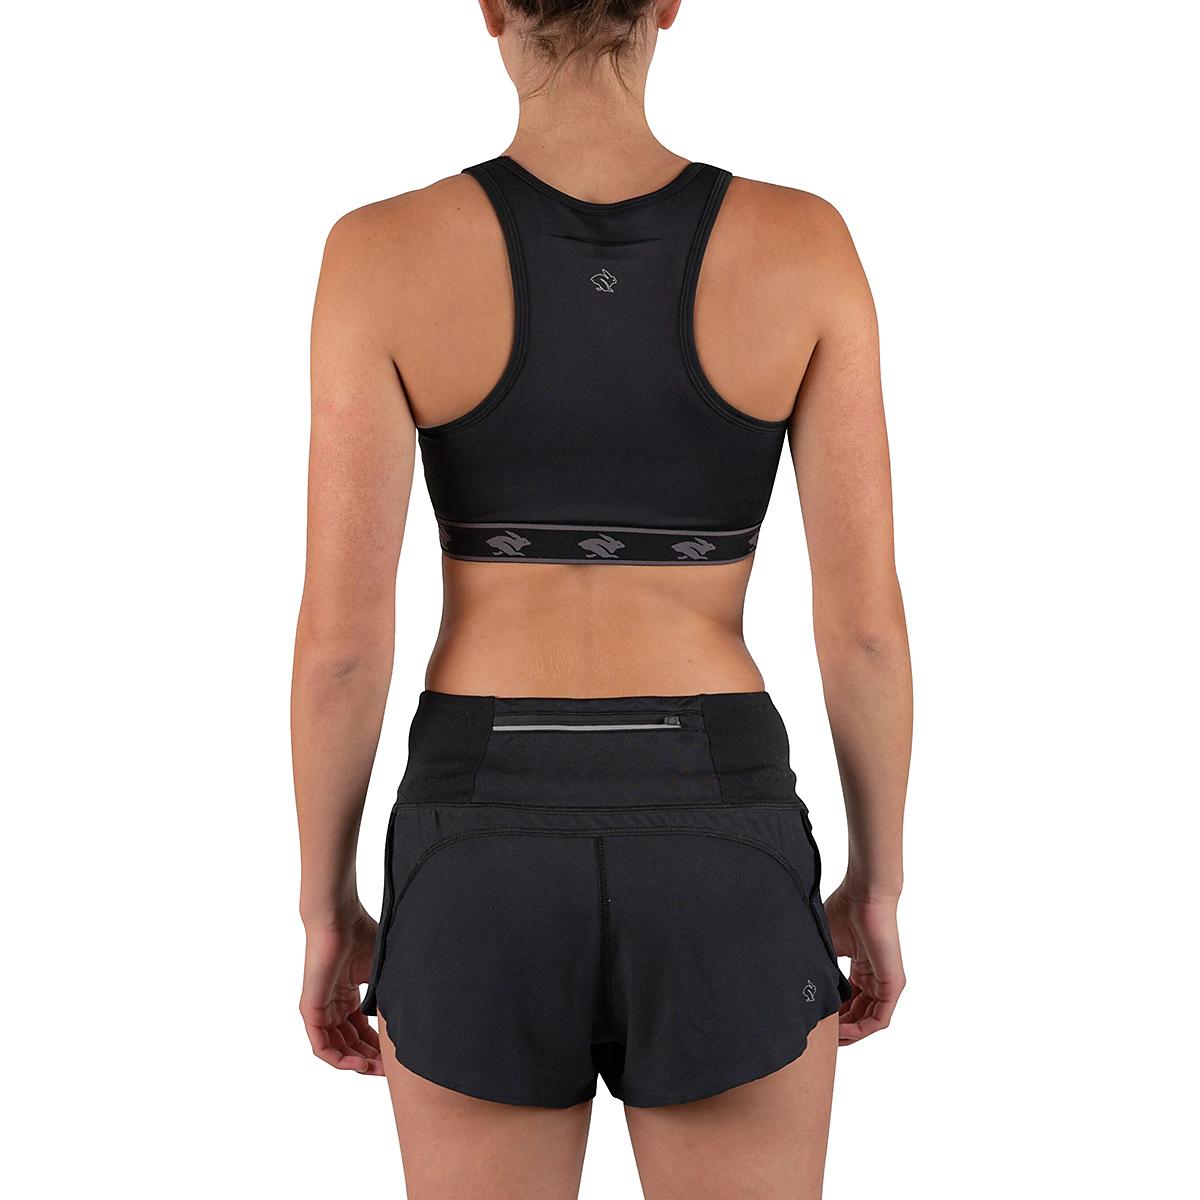 Women's Rabbit UtiliBRA-vo Sports Bra - Color: Black - Size: XS, Black, large, image 2